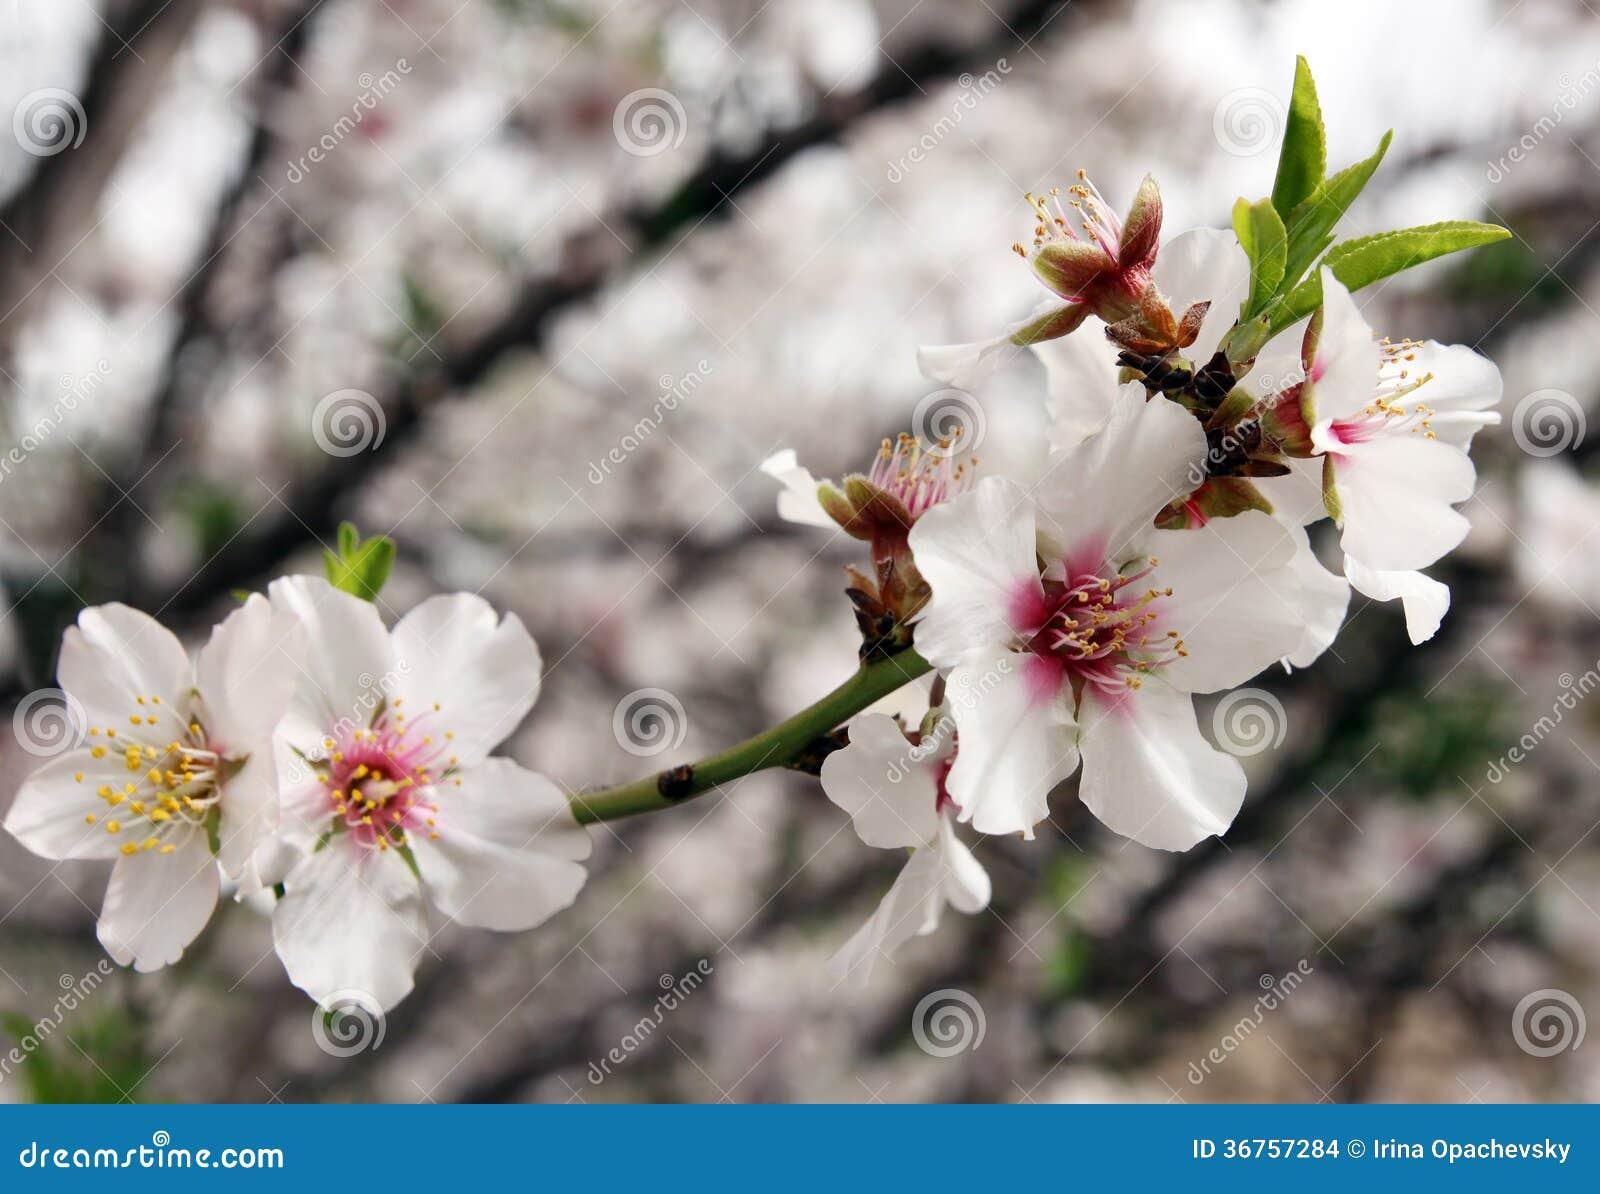 Flowering Almond Tree Stock Image